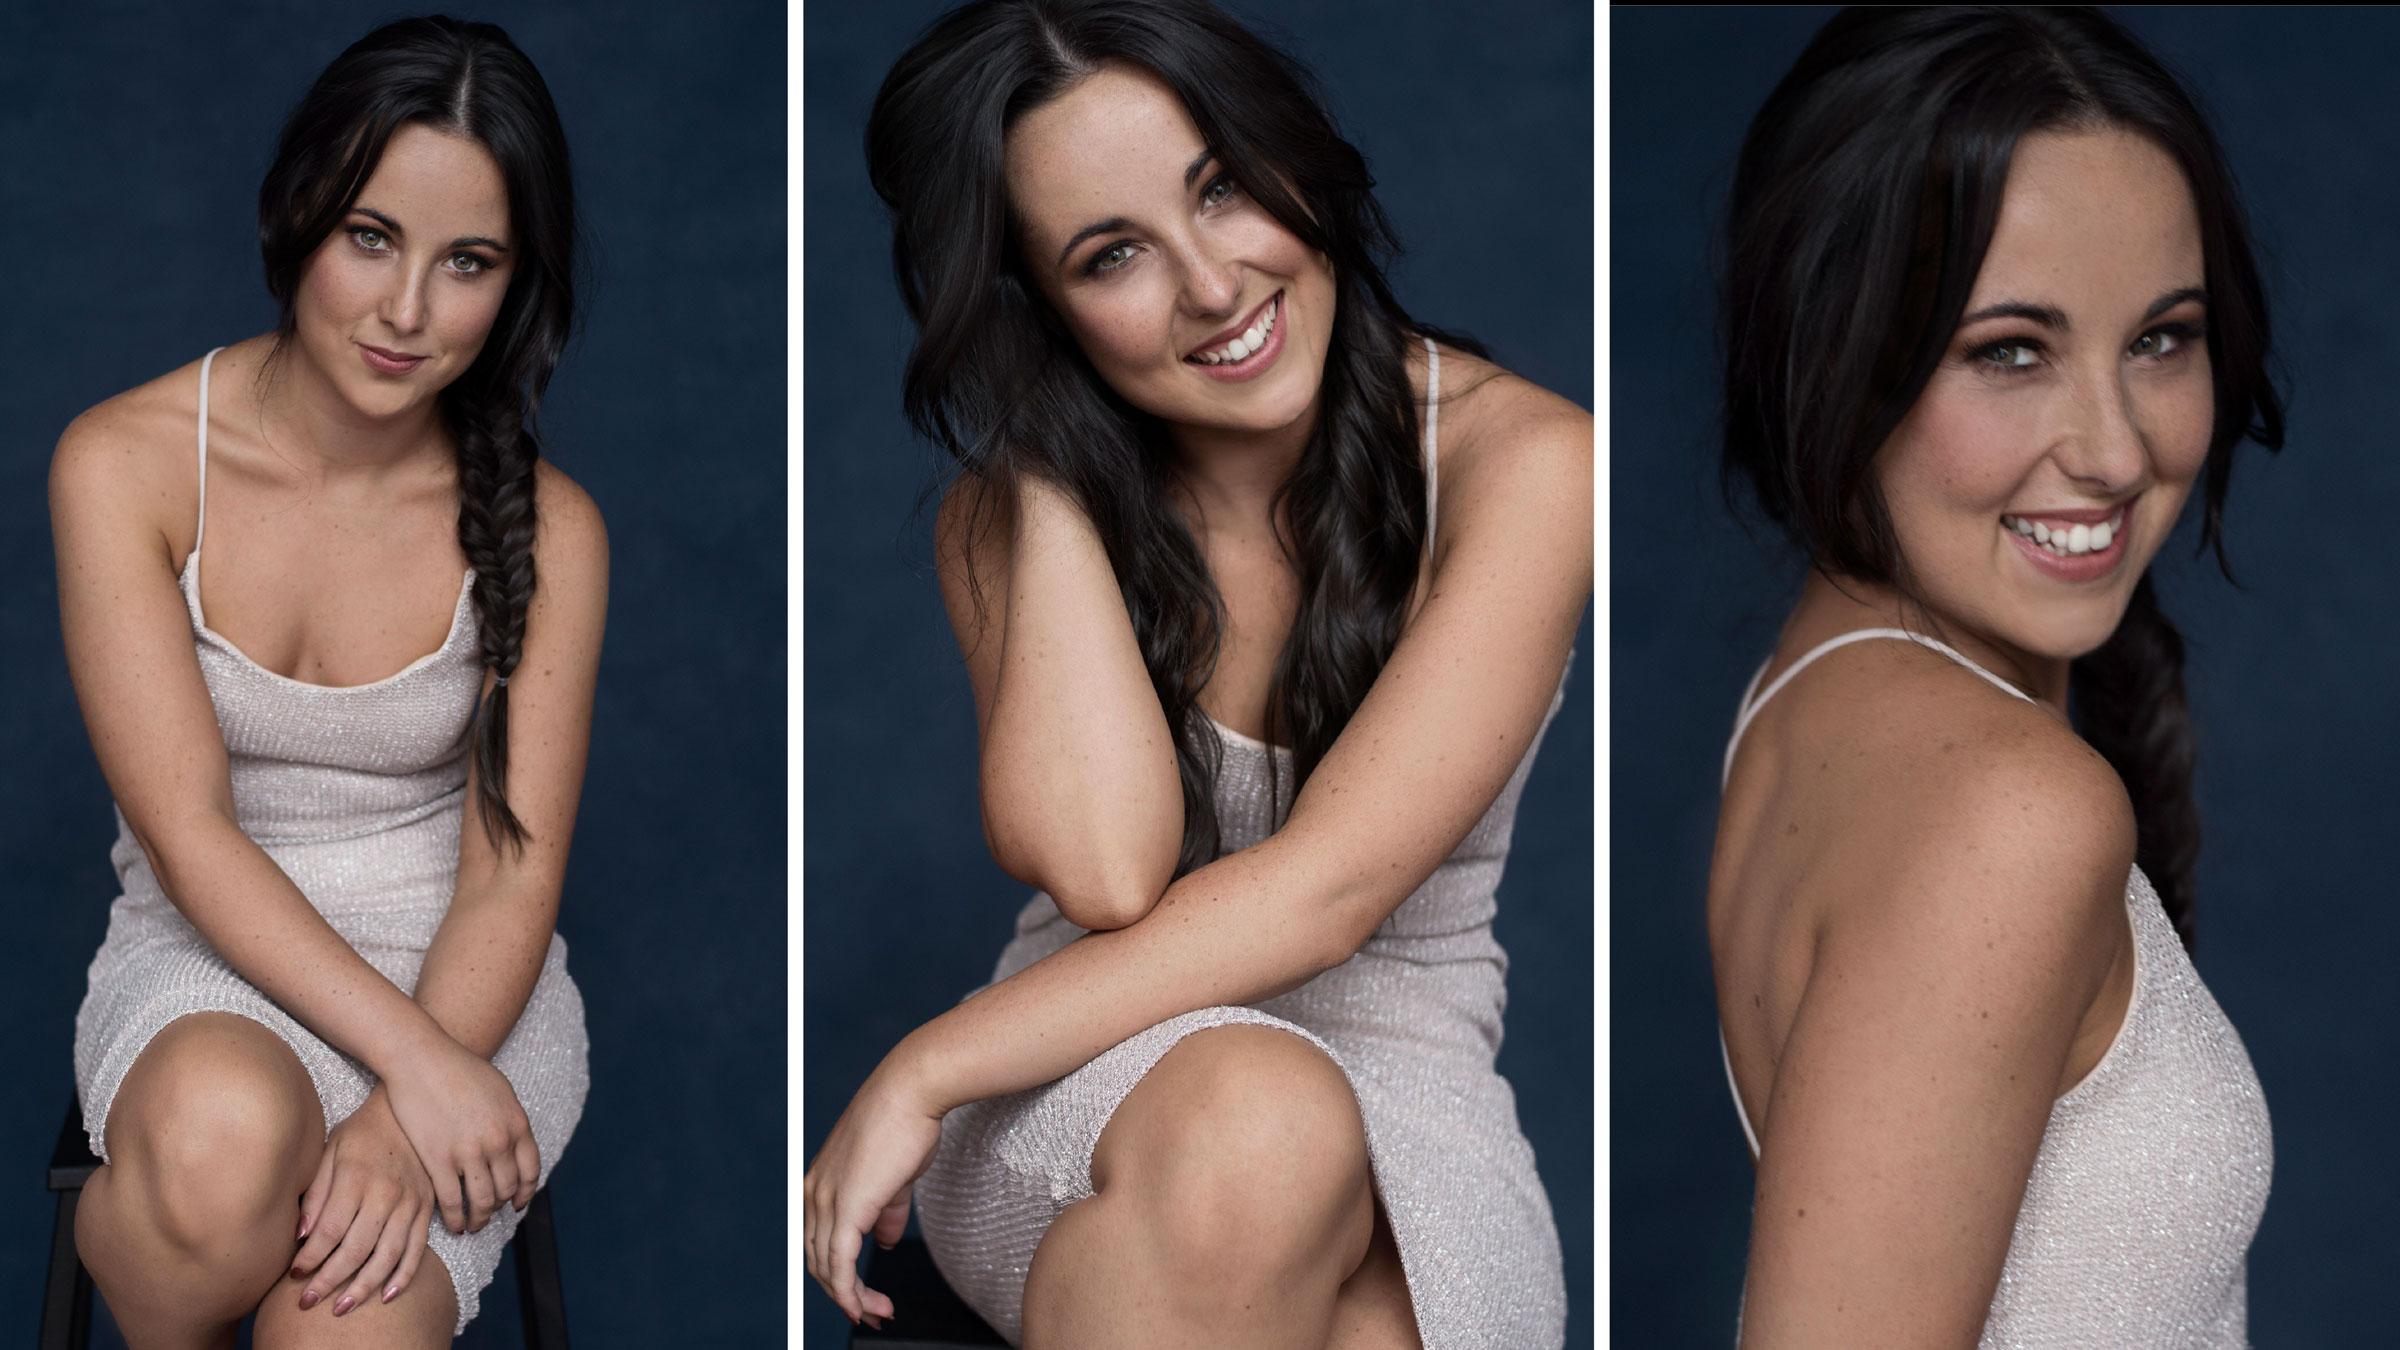 charlotte-kensington-portraits-ultimate-makeover-10.jpg